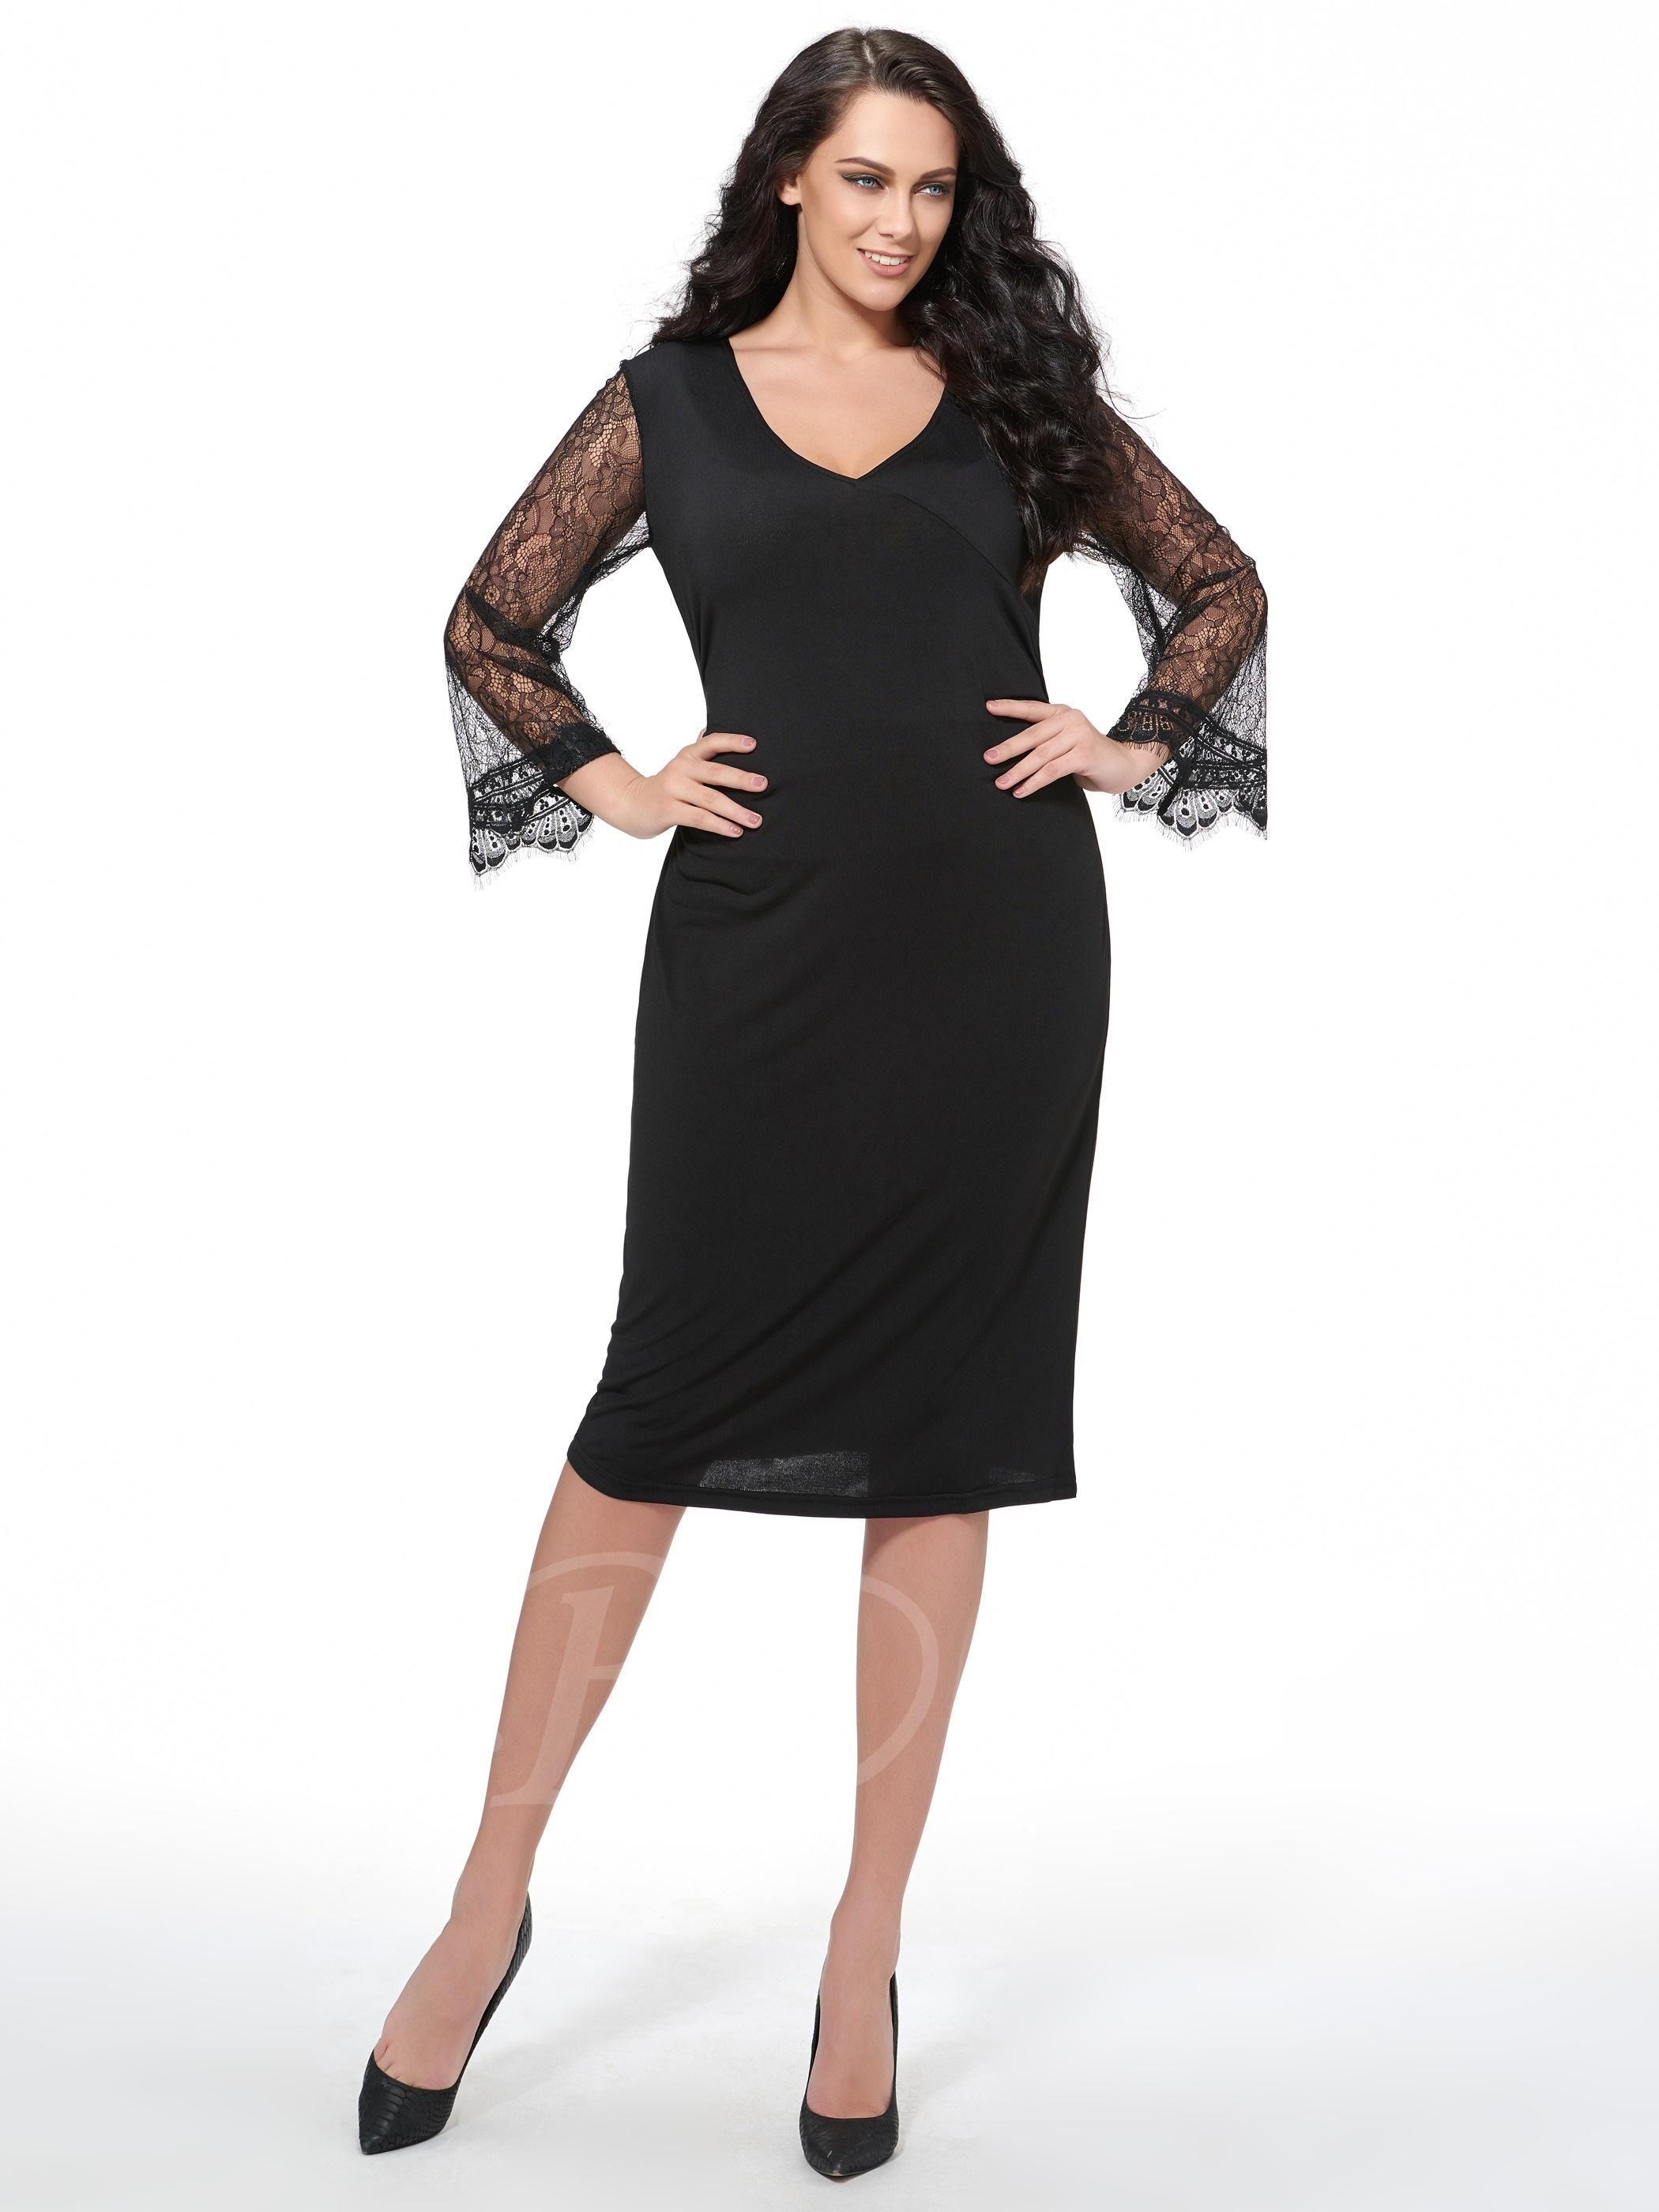 Lace dress styles for funeral  TBDress  TBDress Black V Neck Lace Patchwork Womens Plus Size Dress